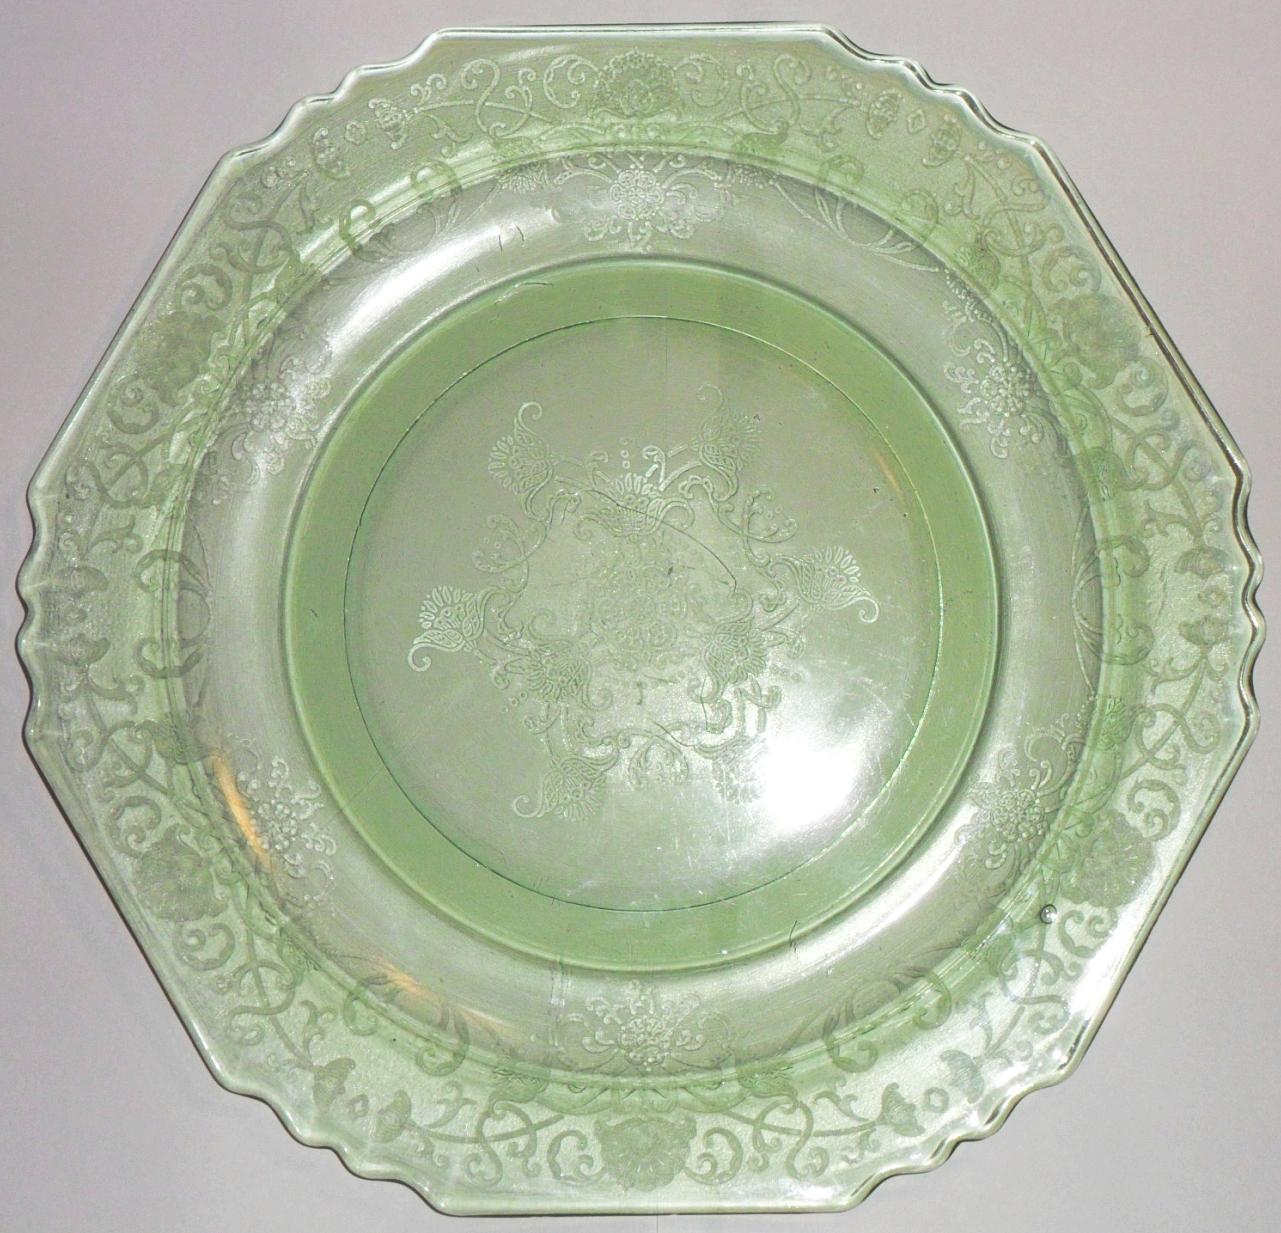 355153506511 Hazel-Atlas Glass Company